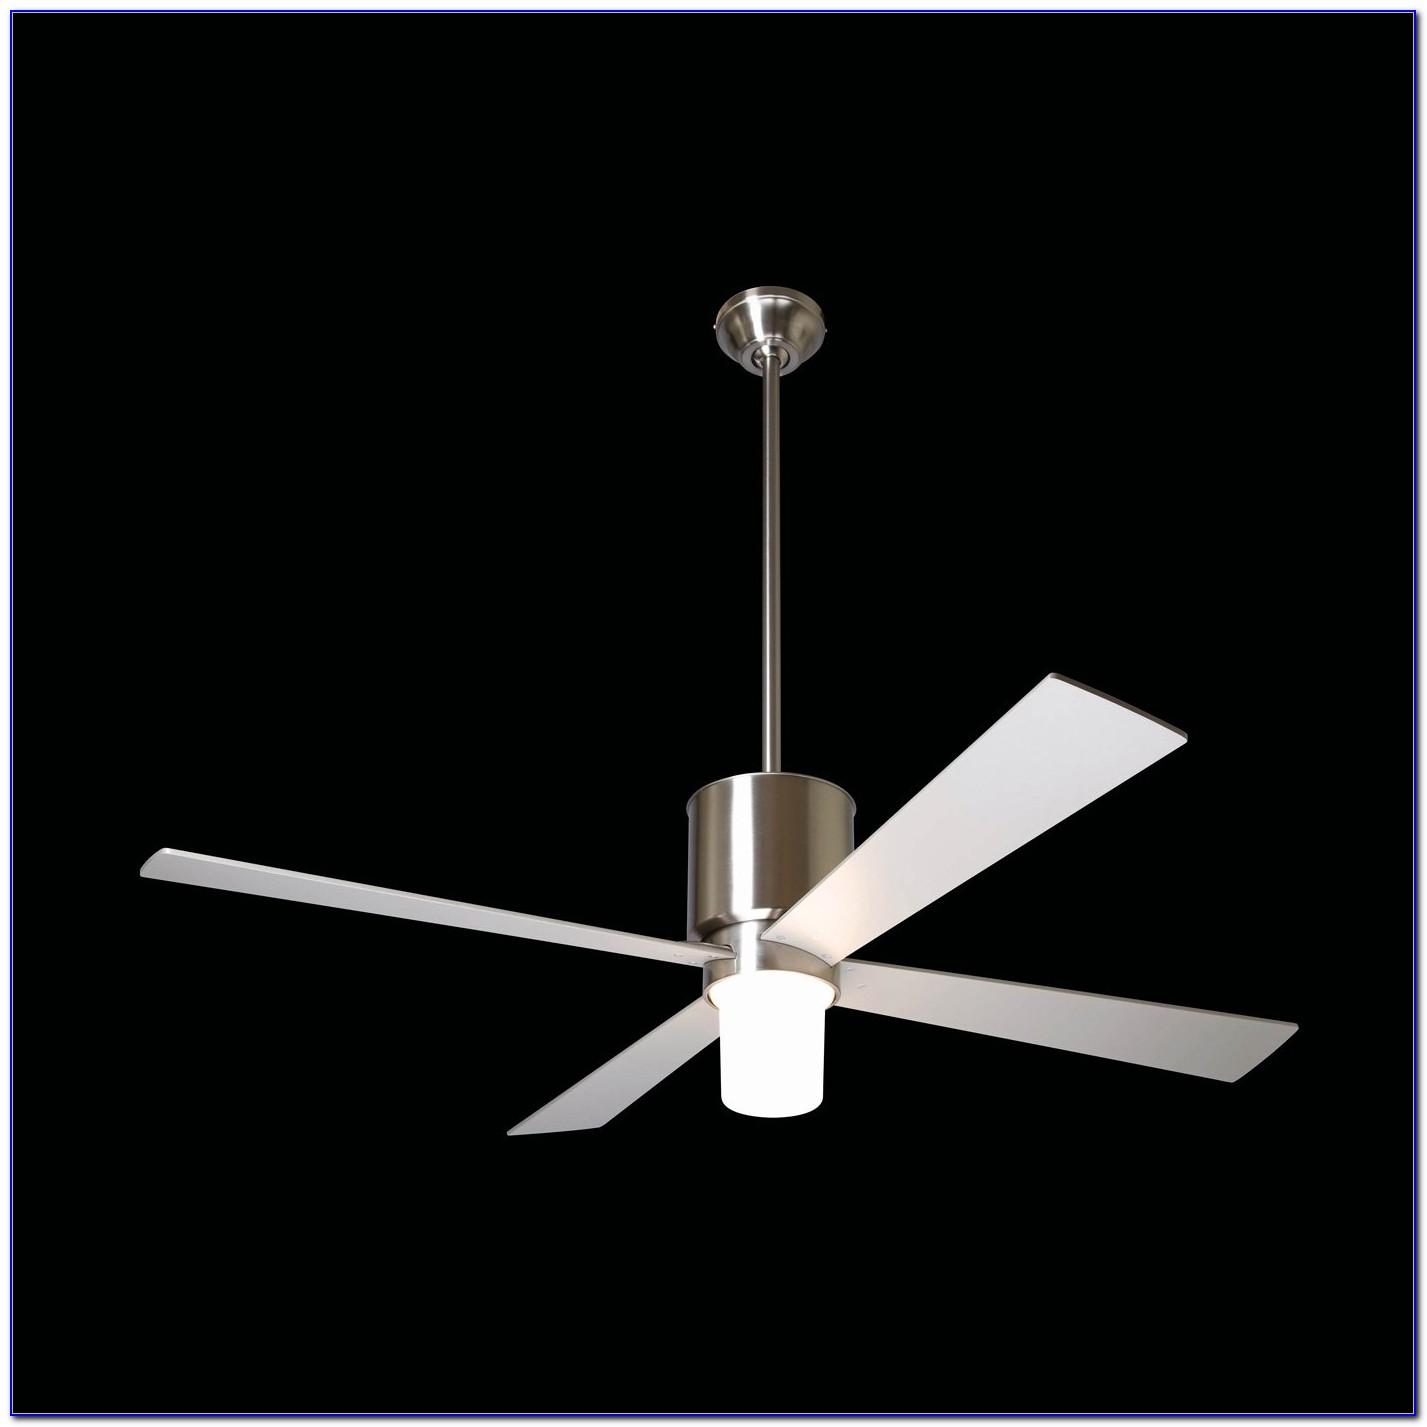 Ceiling Fan With Adjustable Spotlights